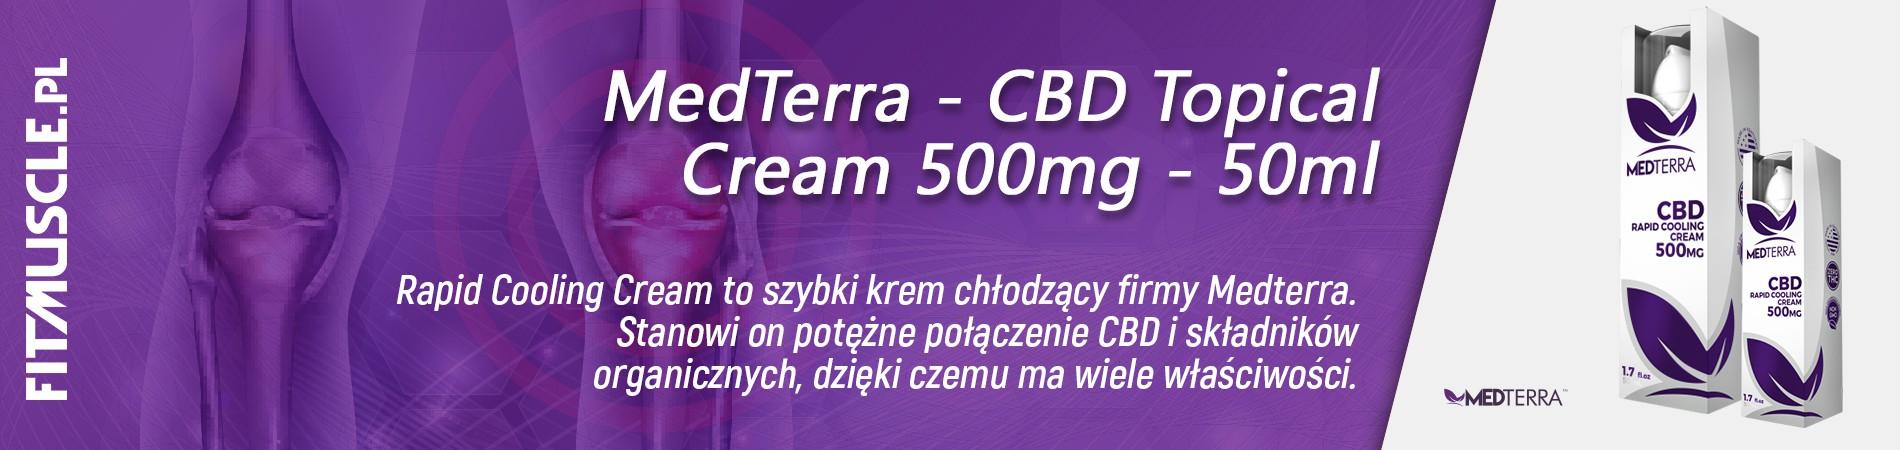 MedTerra   CBD Sport Cream   50ml